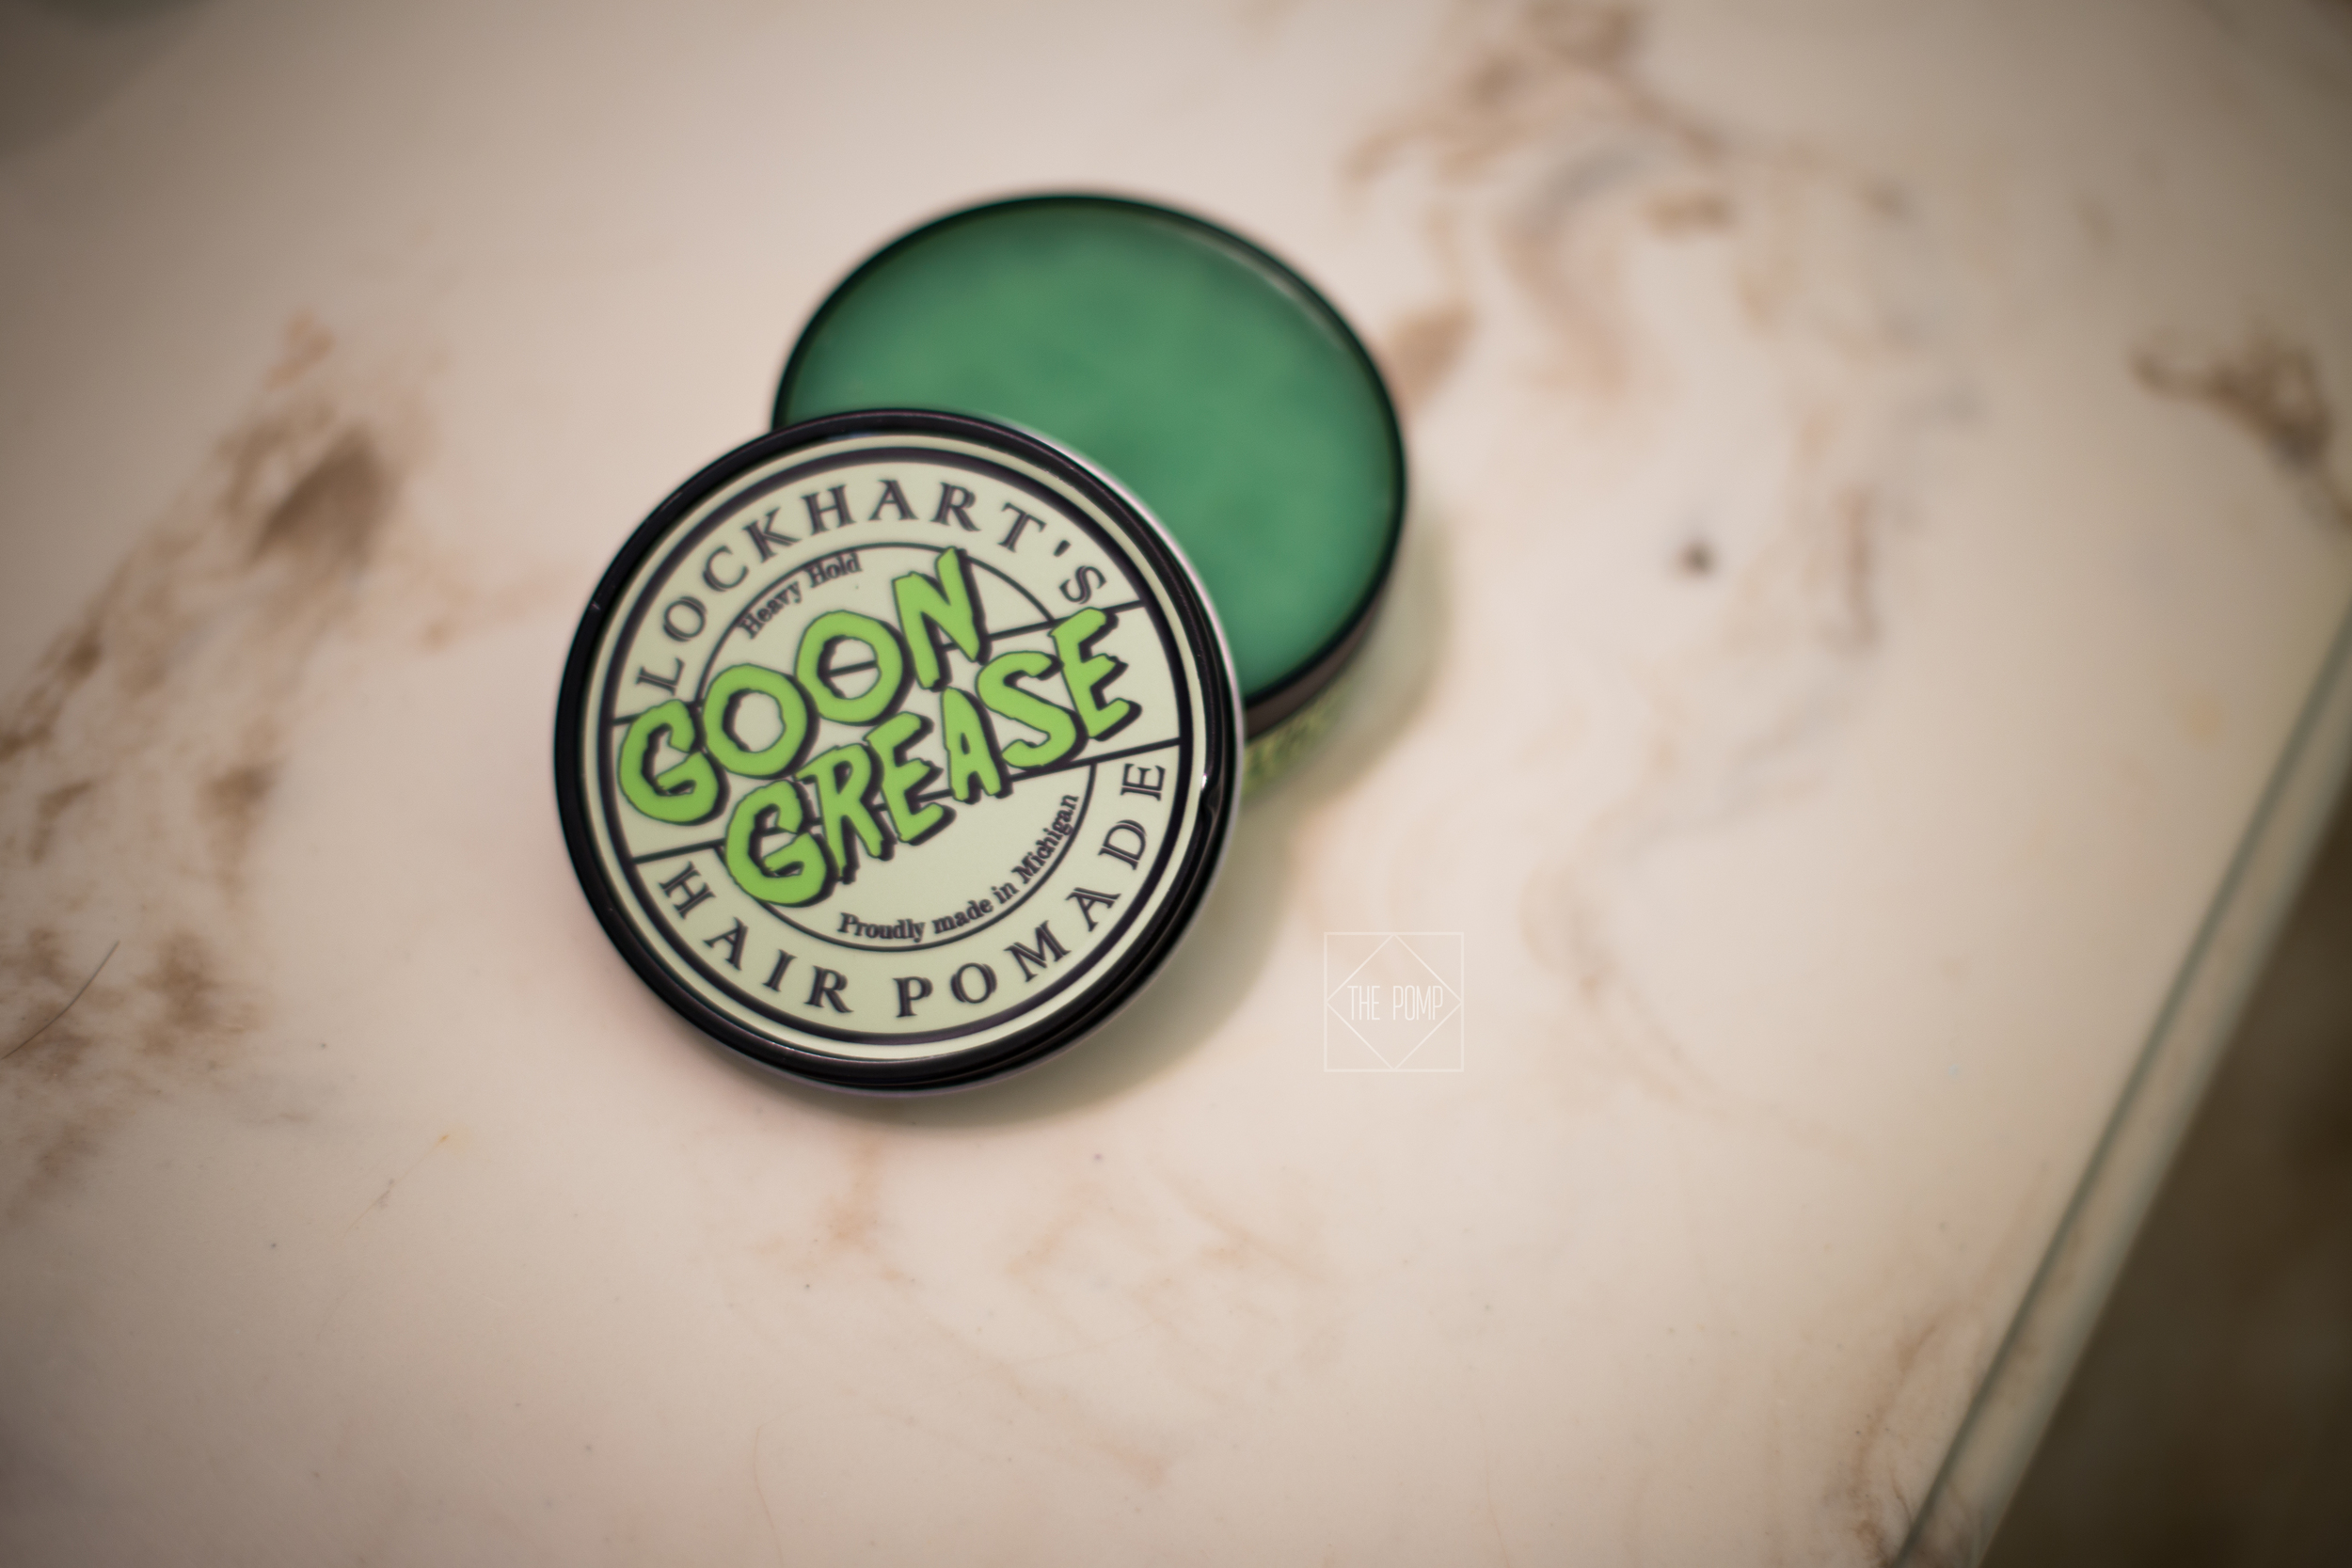 lockhart's goon grease hair pomade - jar